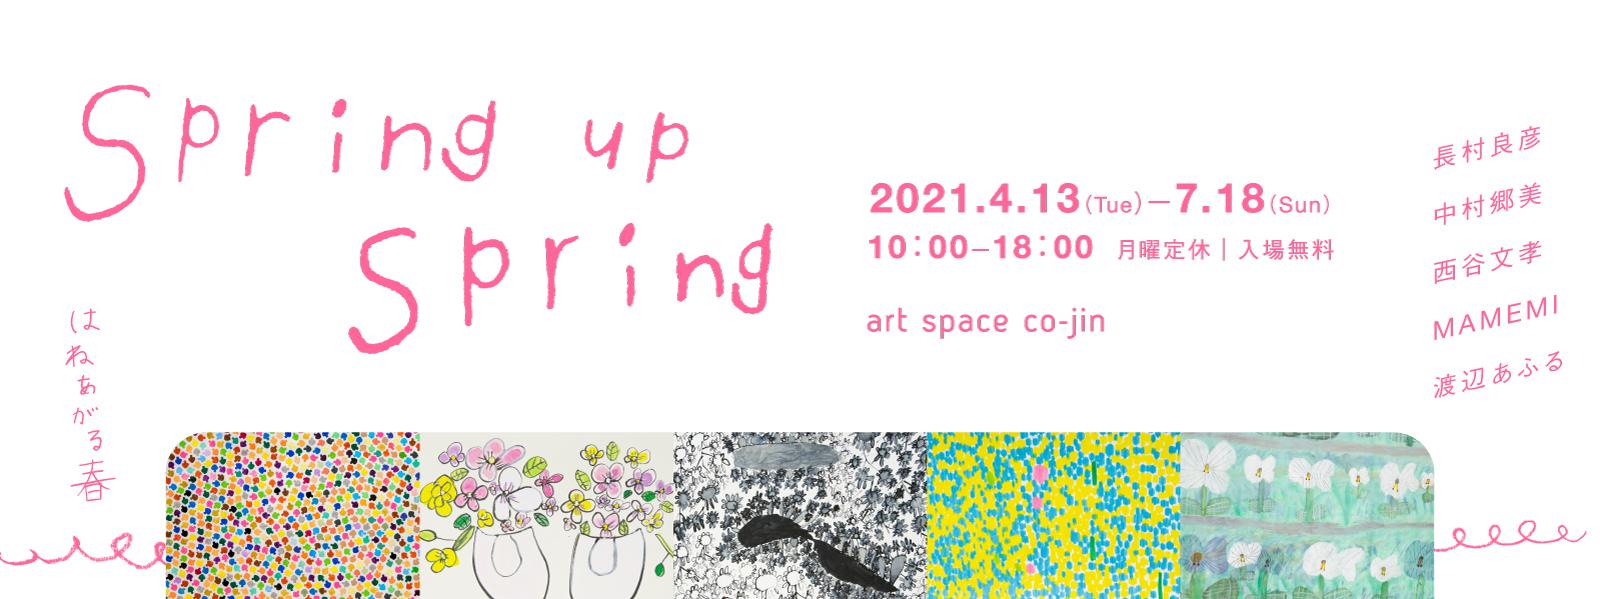 Spring up Spring 展 2021年4月13日(火)〜7月18日(日)*月曜休廊 10:00-18:00